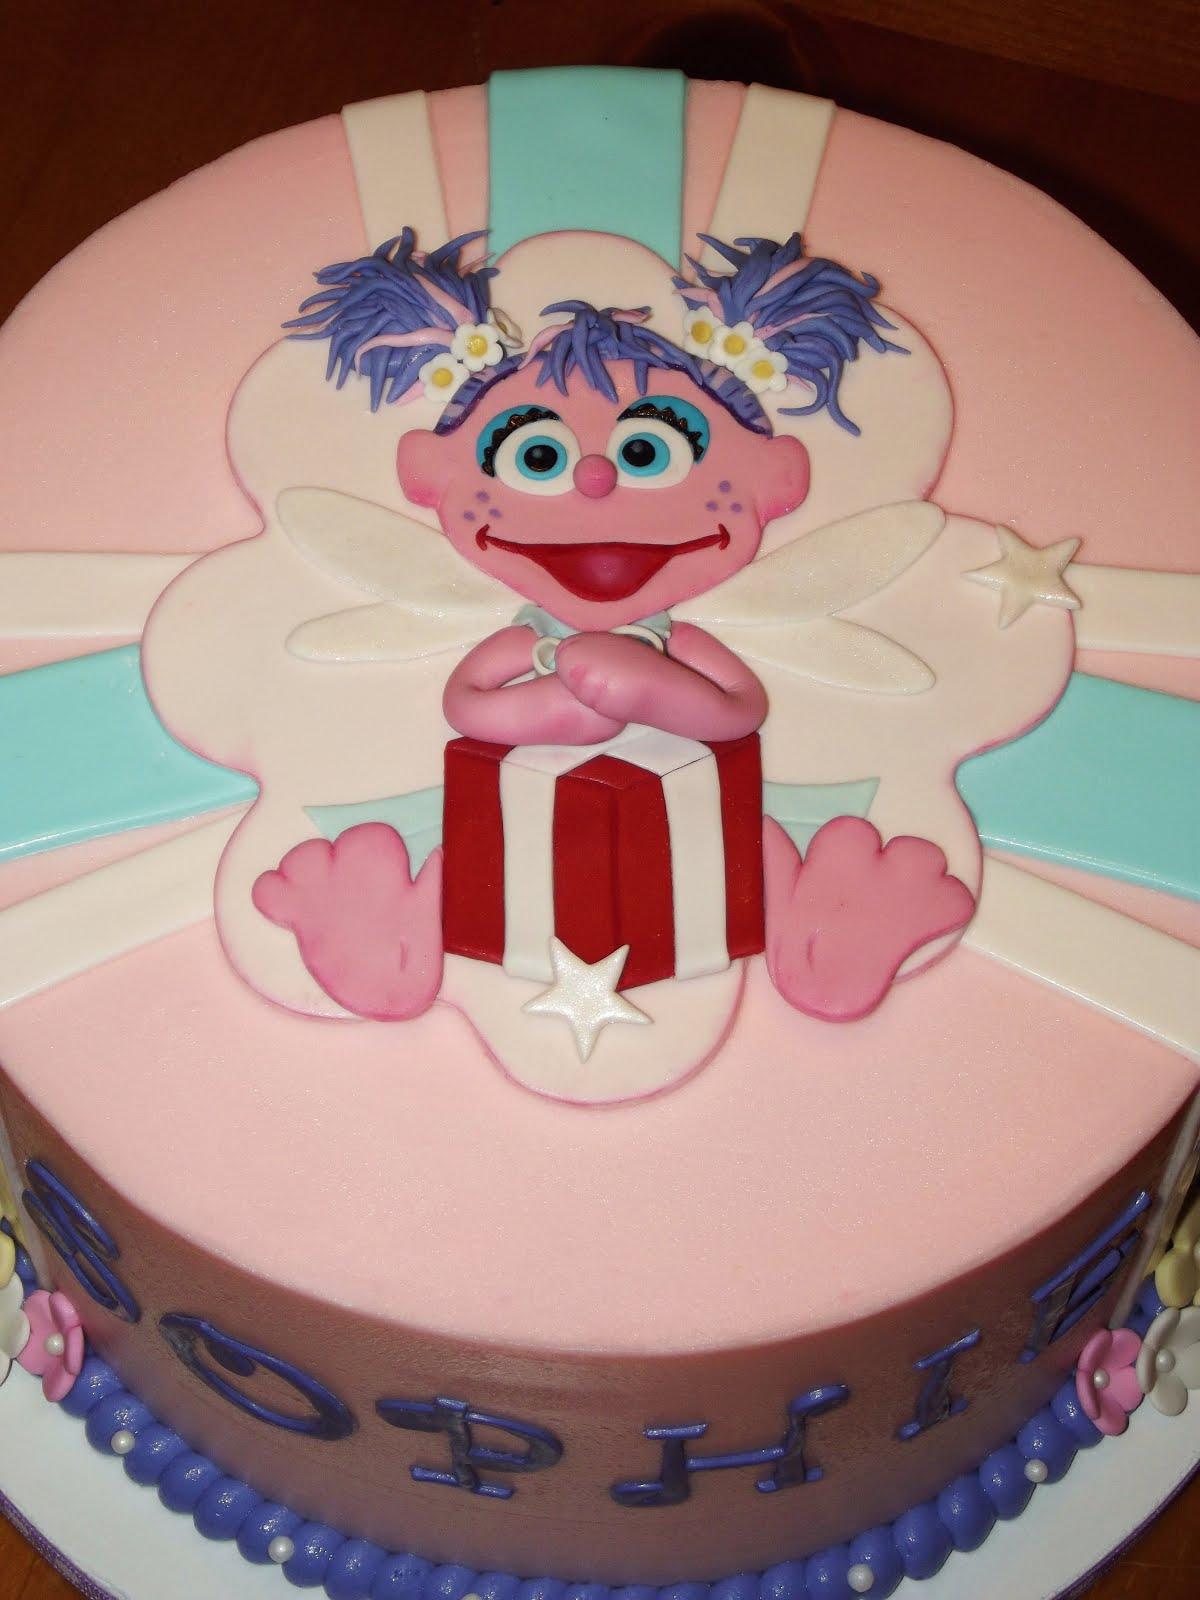 Suzy S Sweet Shoppe Sesame Street Abby Cadabby Cake